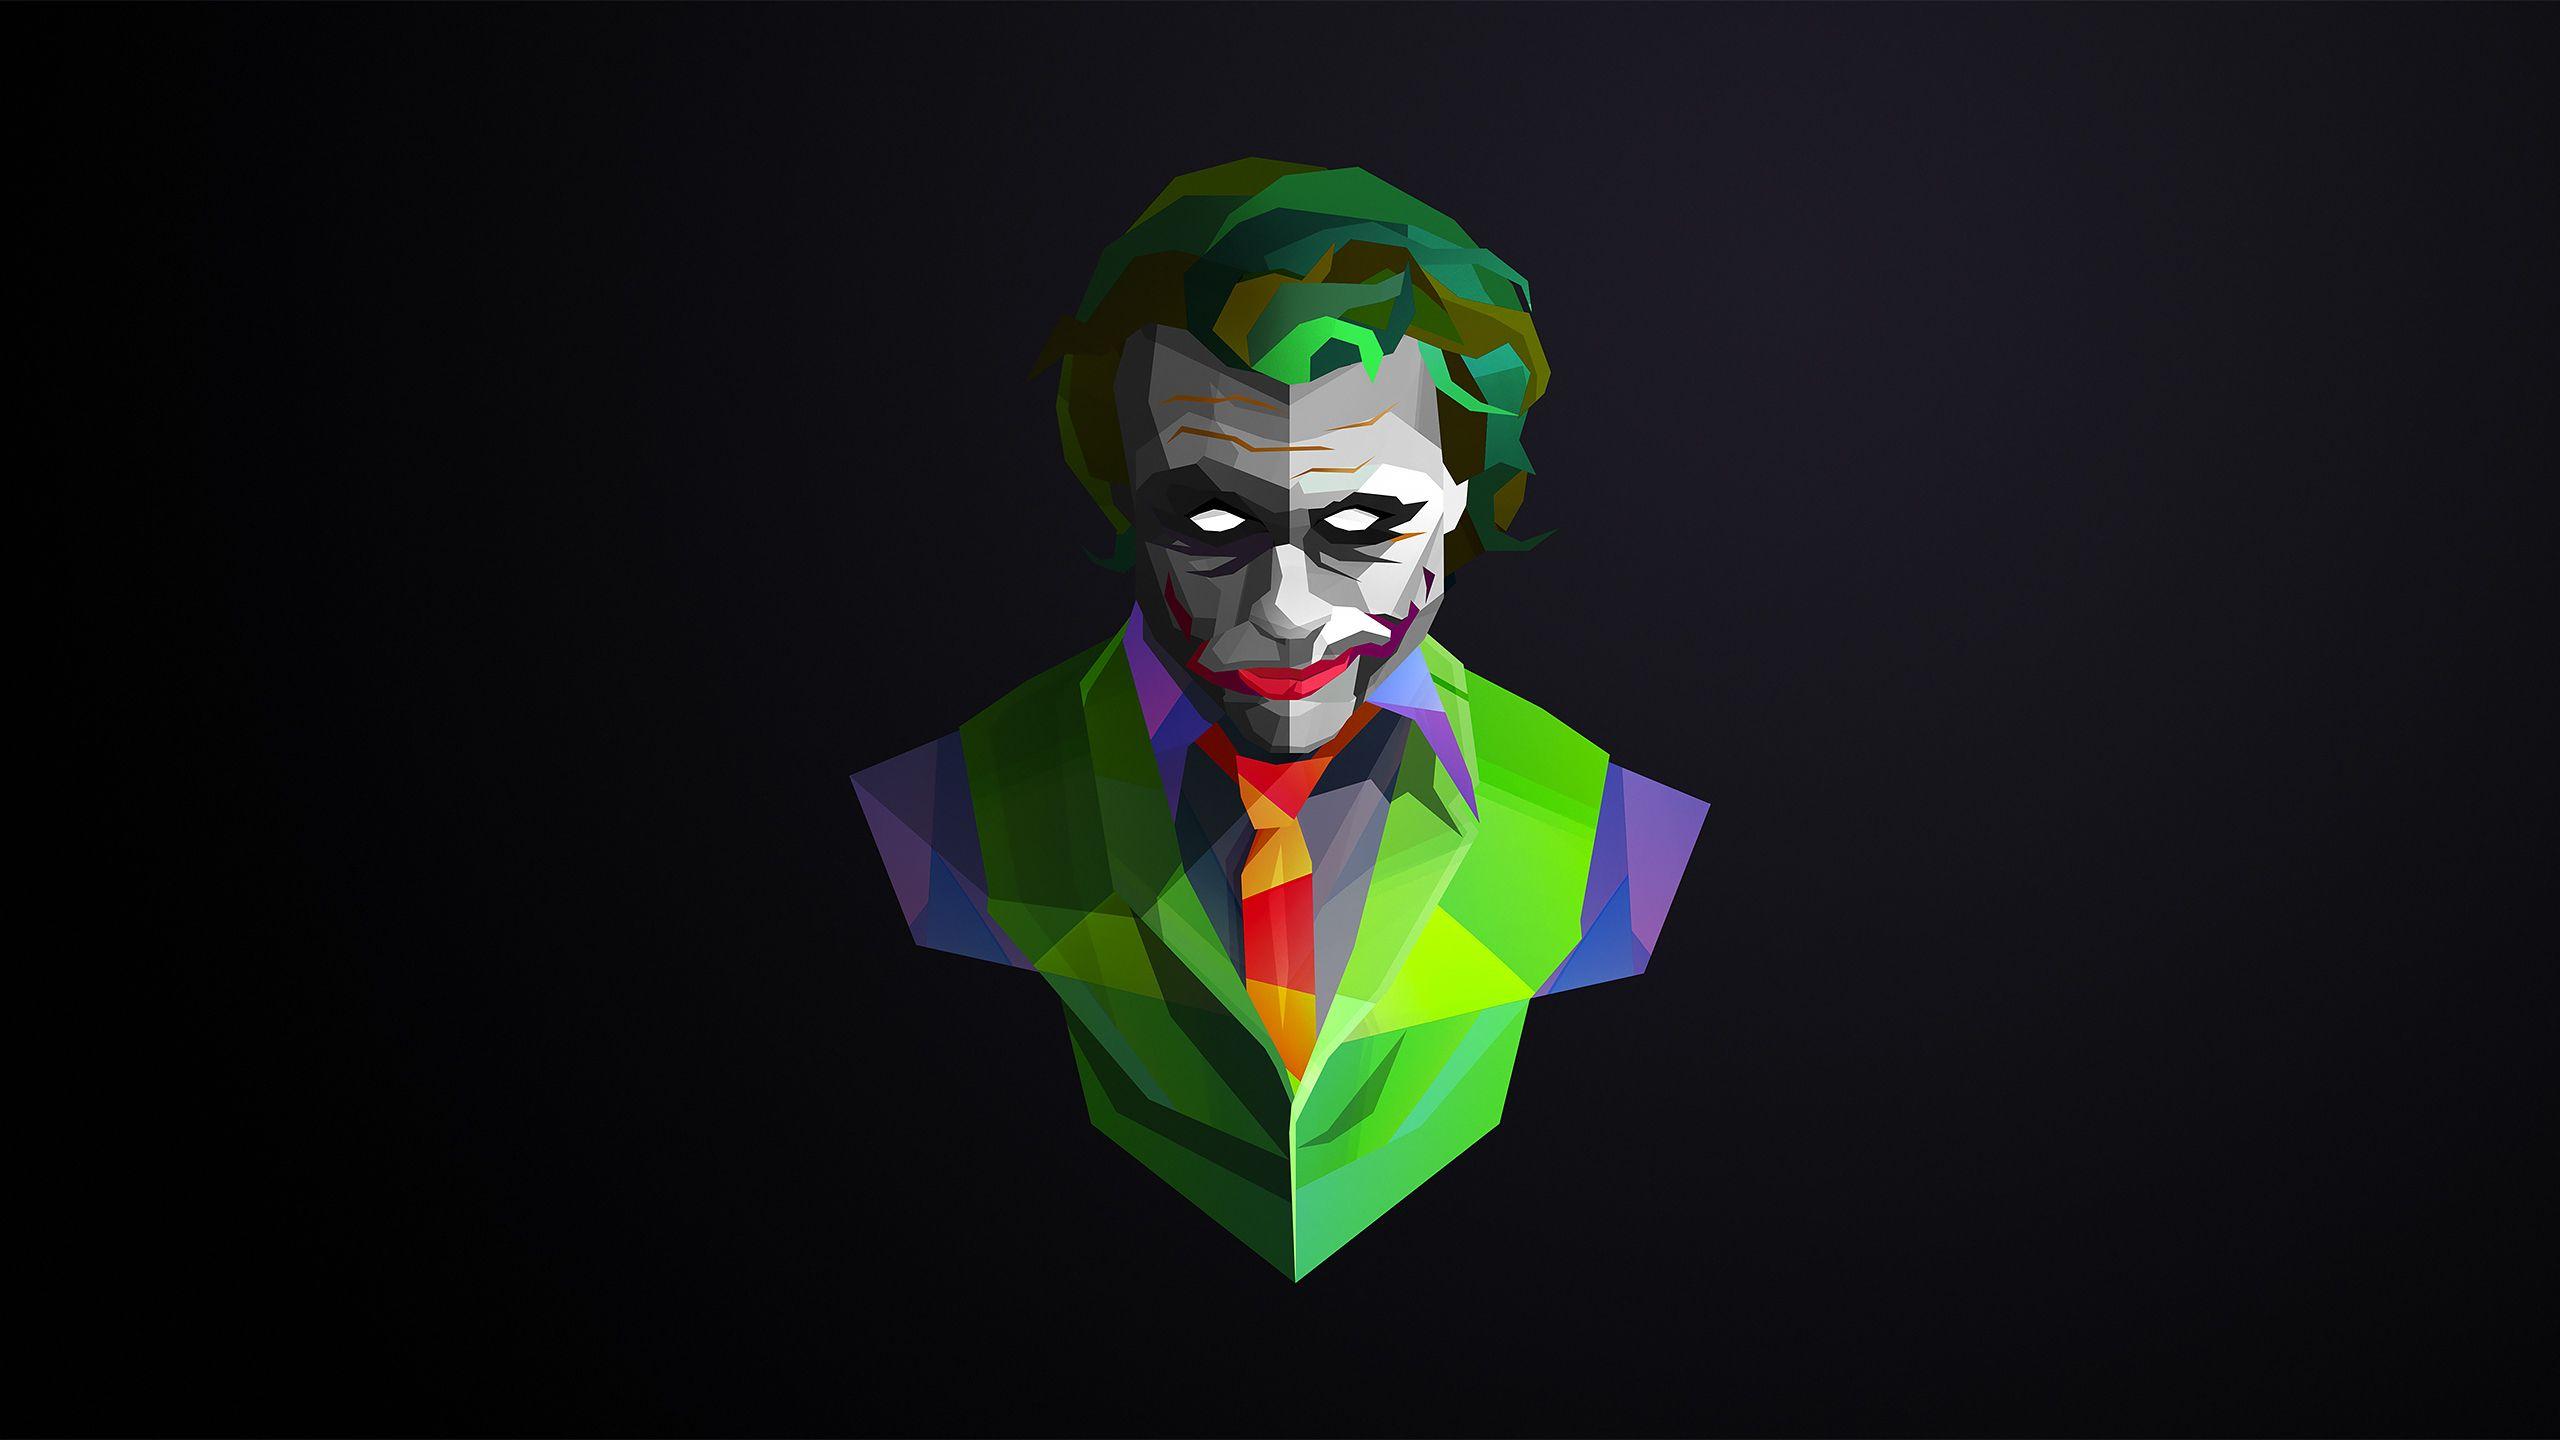 Justin M Maller Wallpaper Joker Joker Wallpapers Joker Hd Wallpaper Joker Background